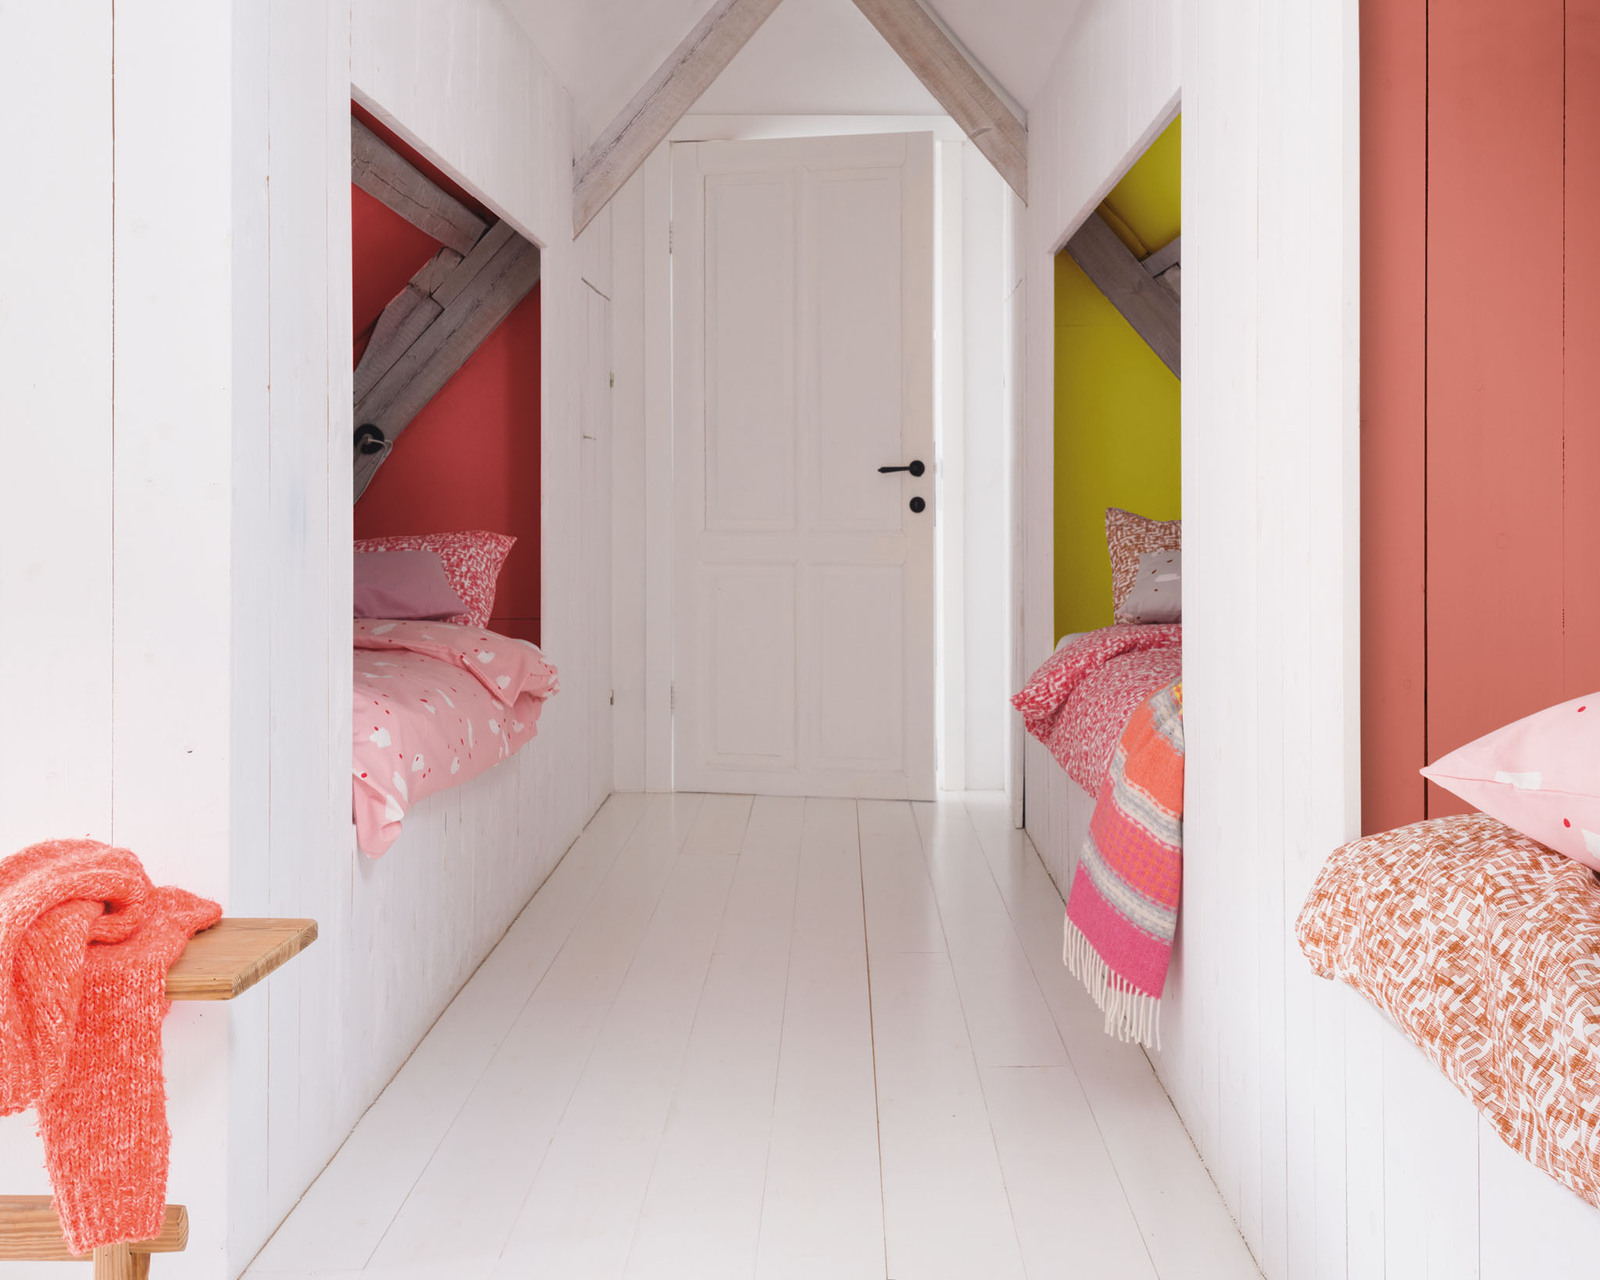 inspiring_ideas_for_childrens_bedrooms_2048x1638_1.jpg